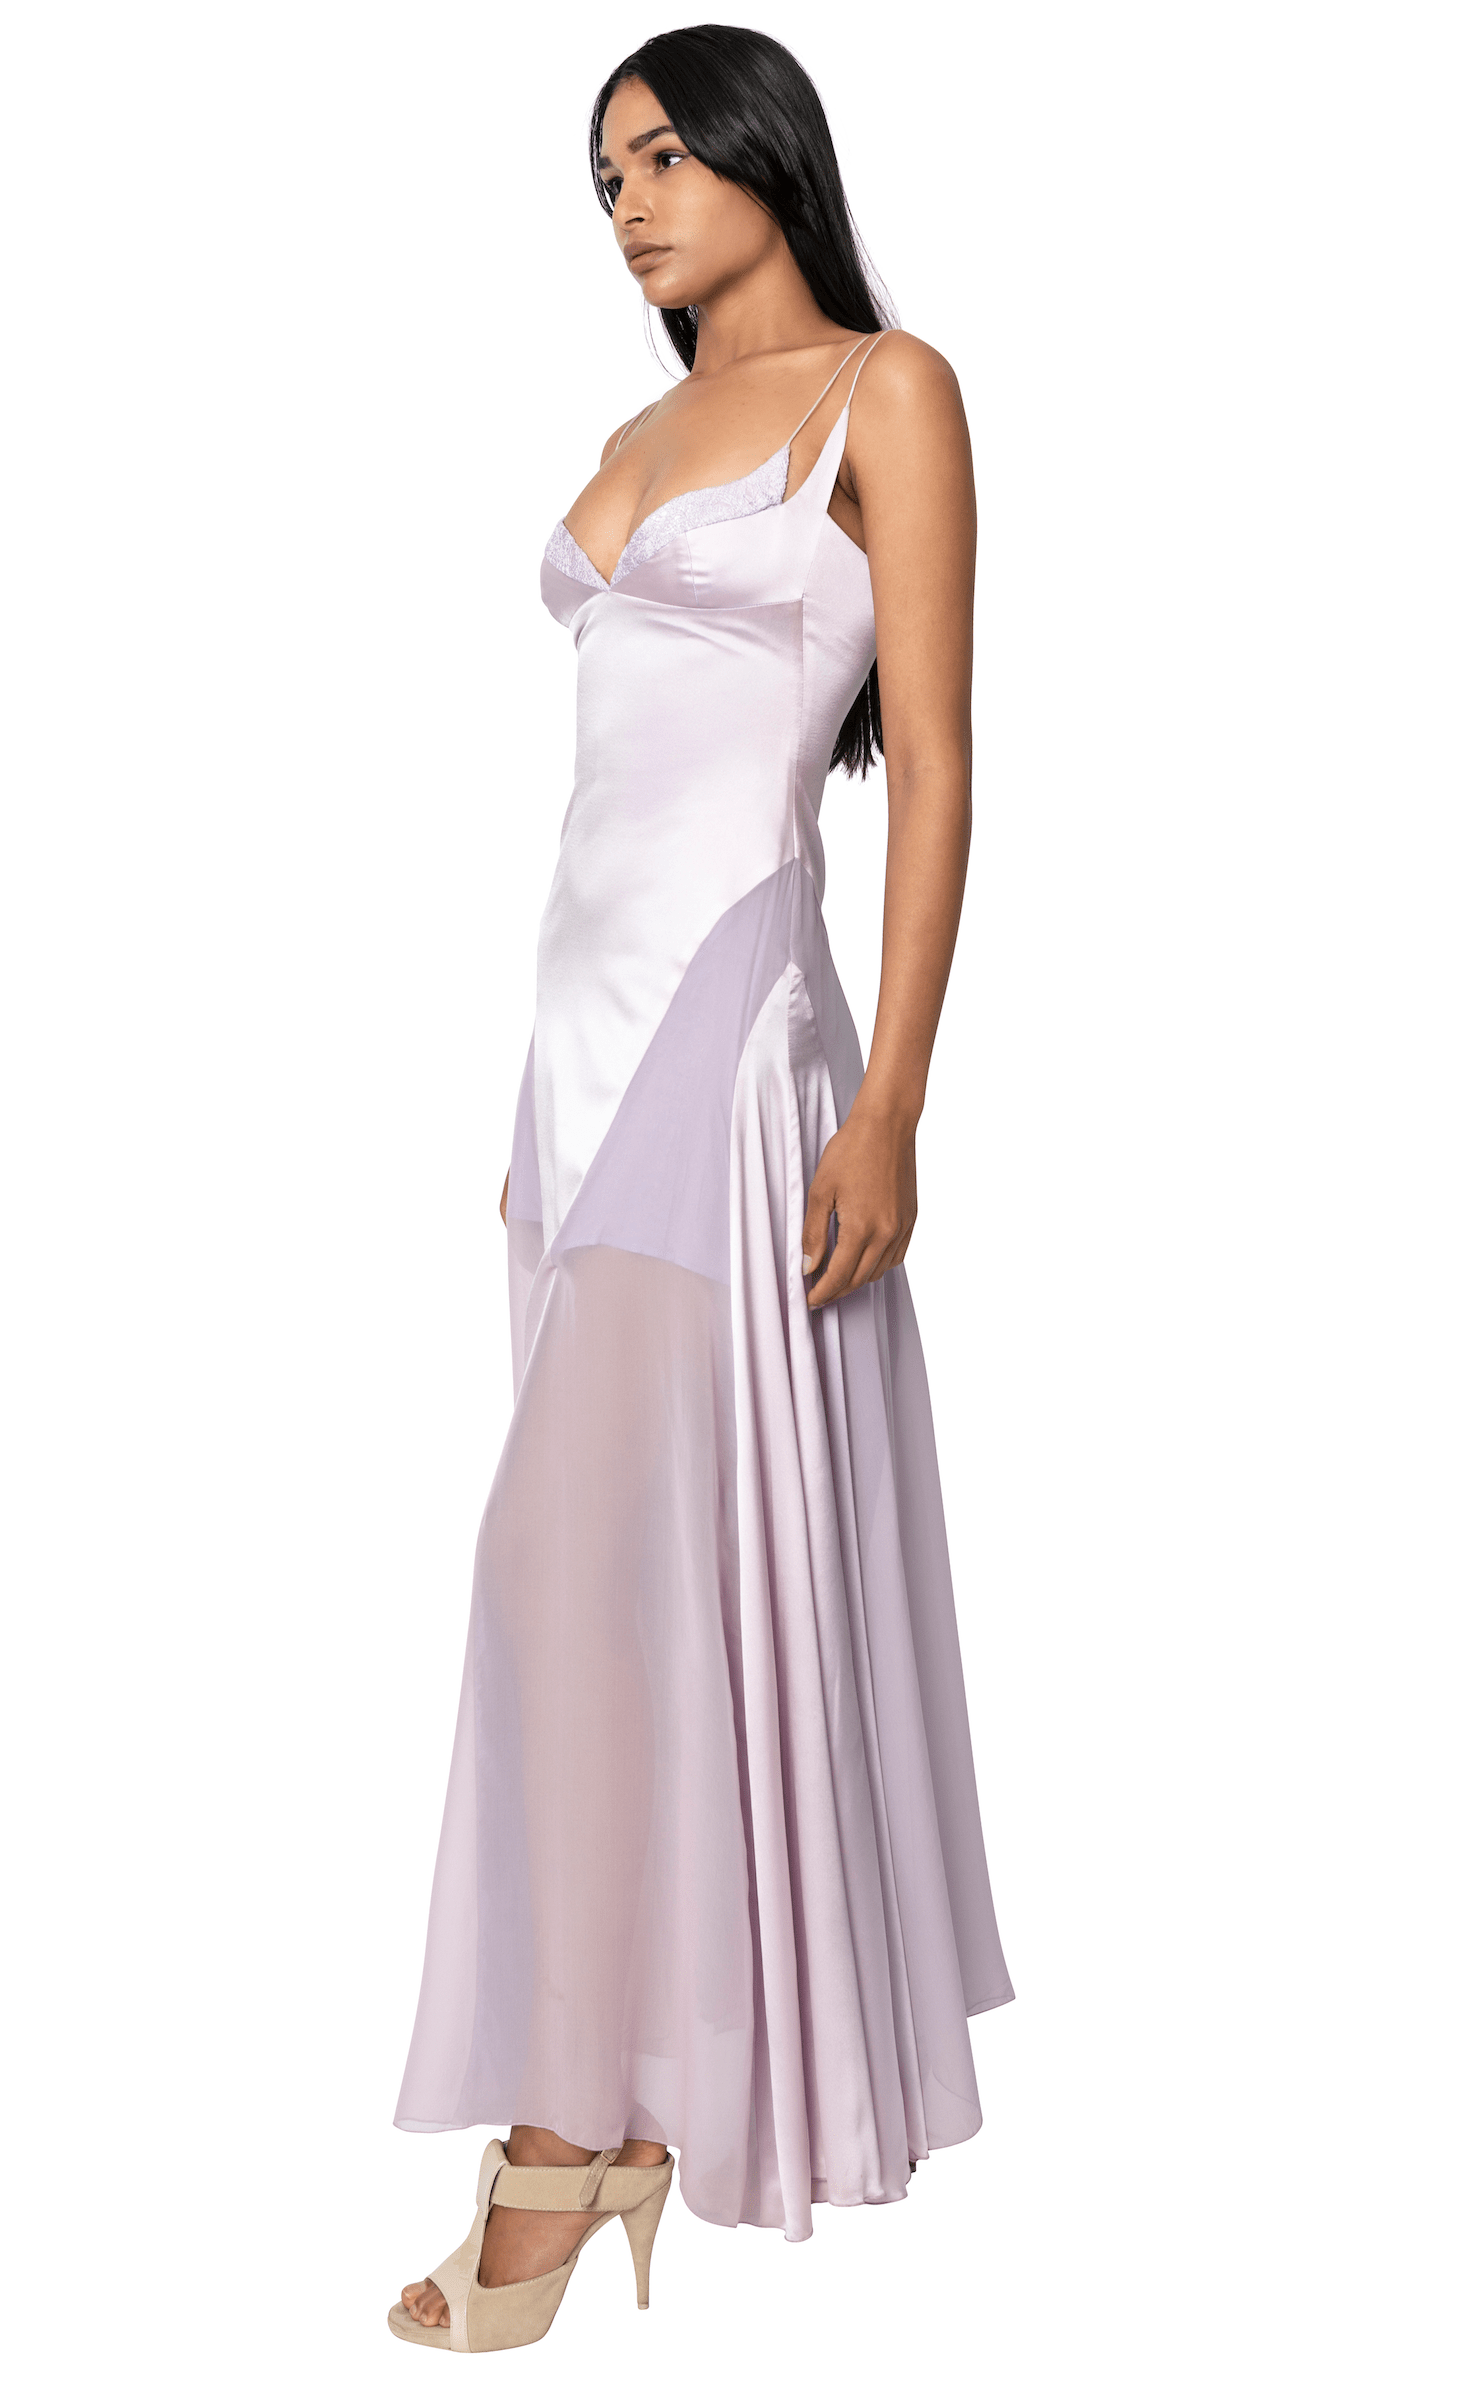 Dress ESTRELA 0